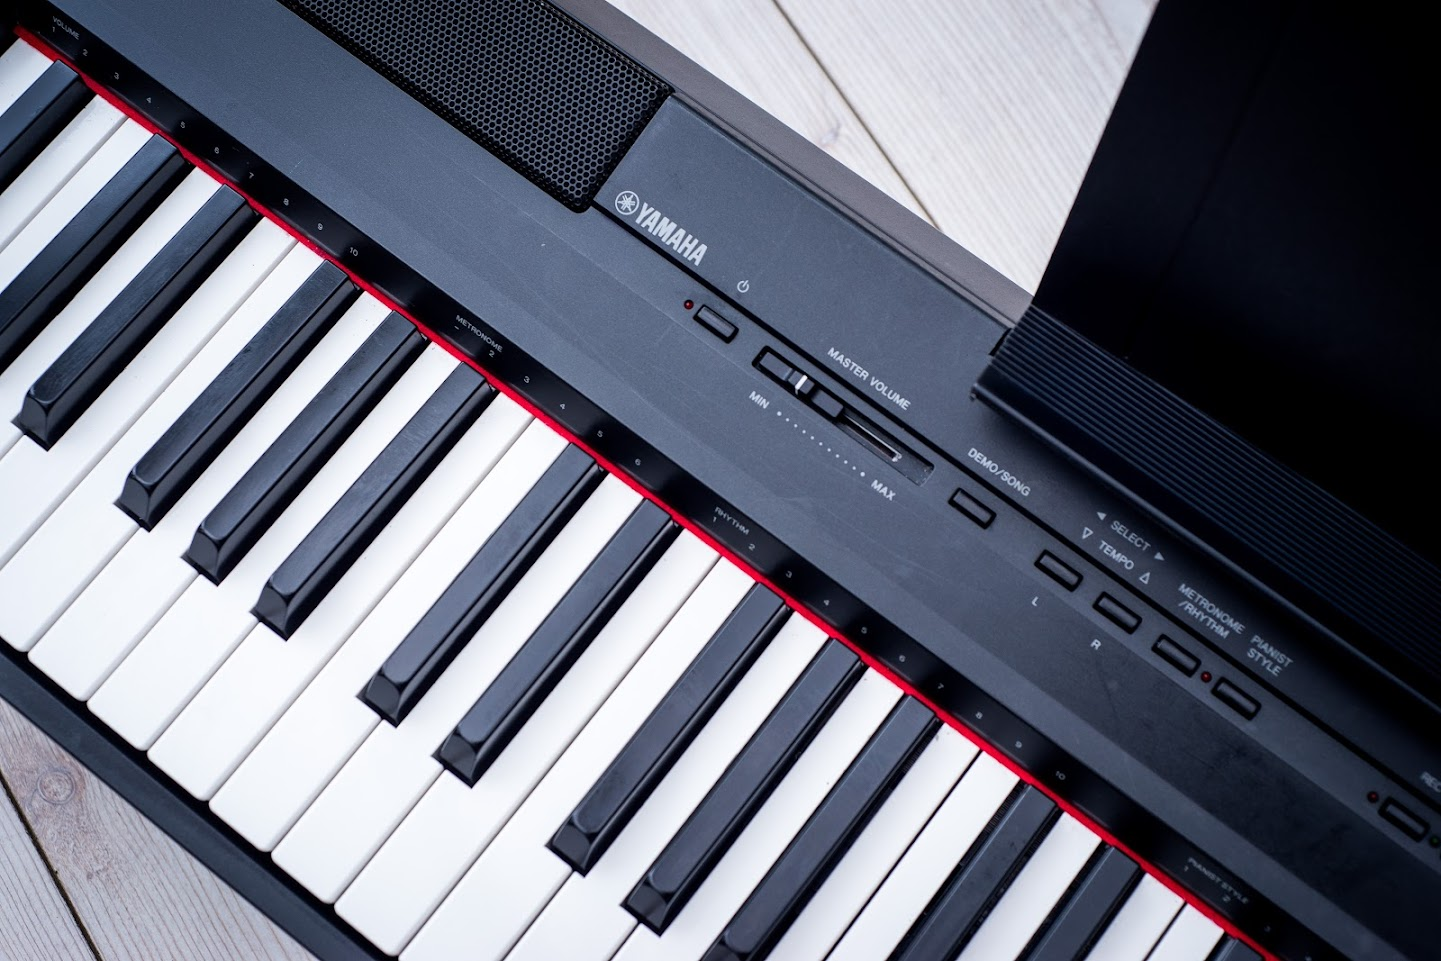 Yamaha p105 digital piano 88 notes key full size ghe for Yamaha full size keyboard with 88 keys